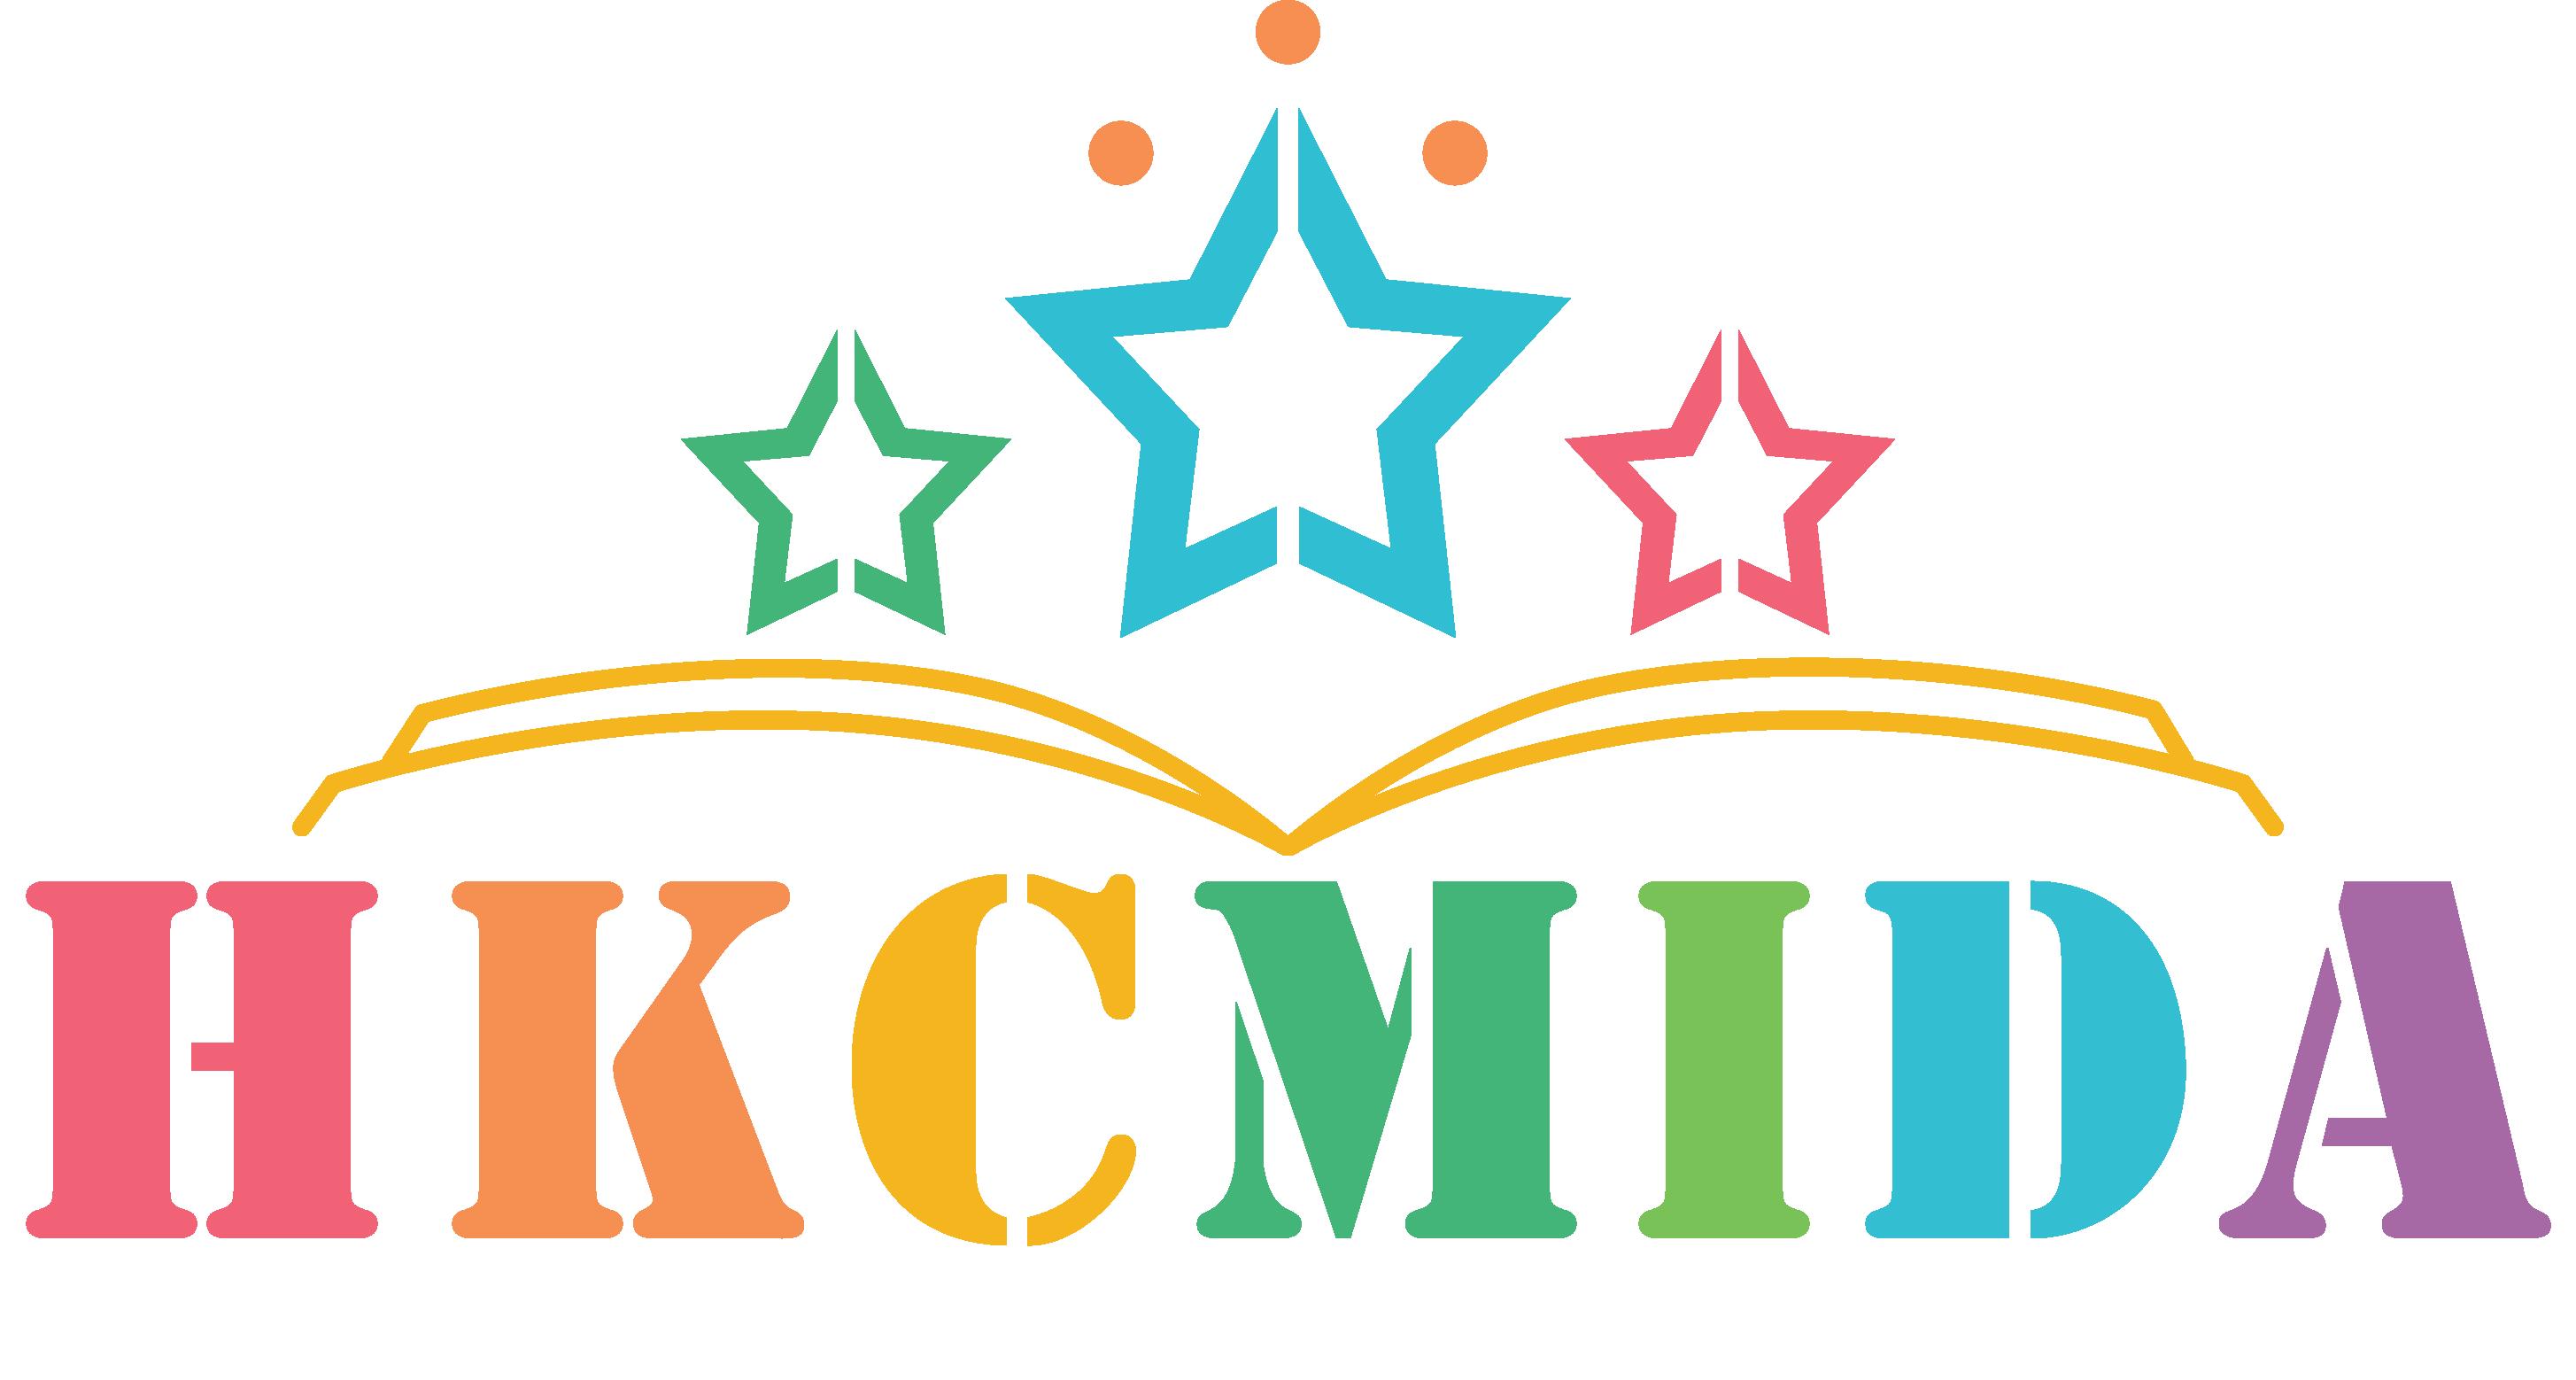 Hong Kong Childrens Multiple Intelligence Development Association Limited